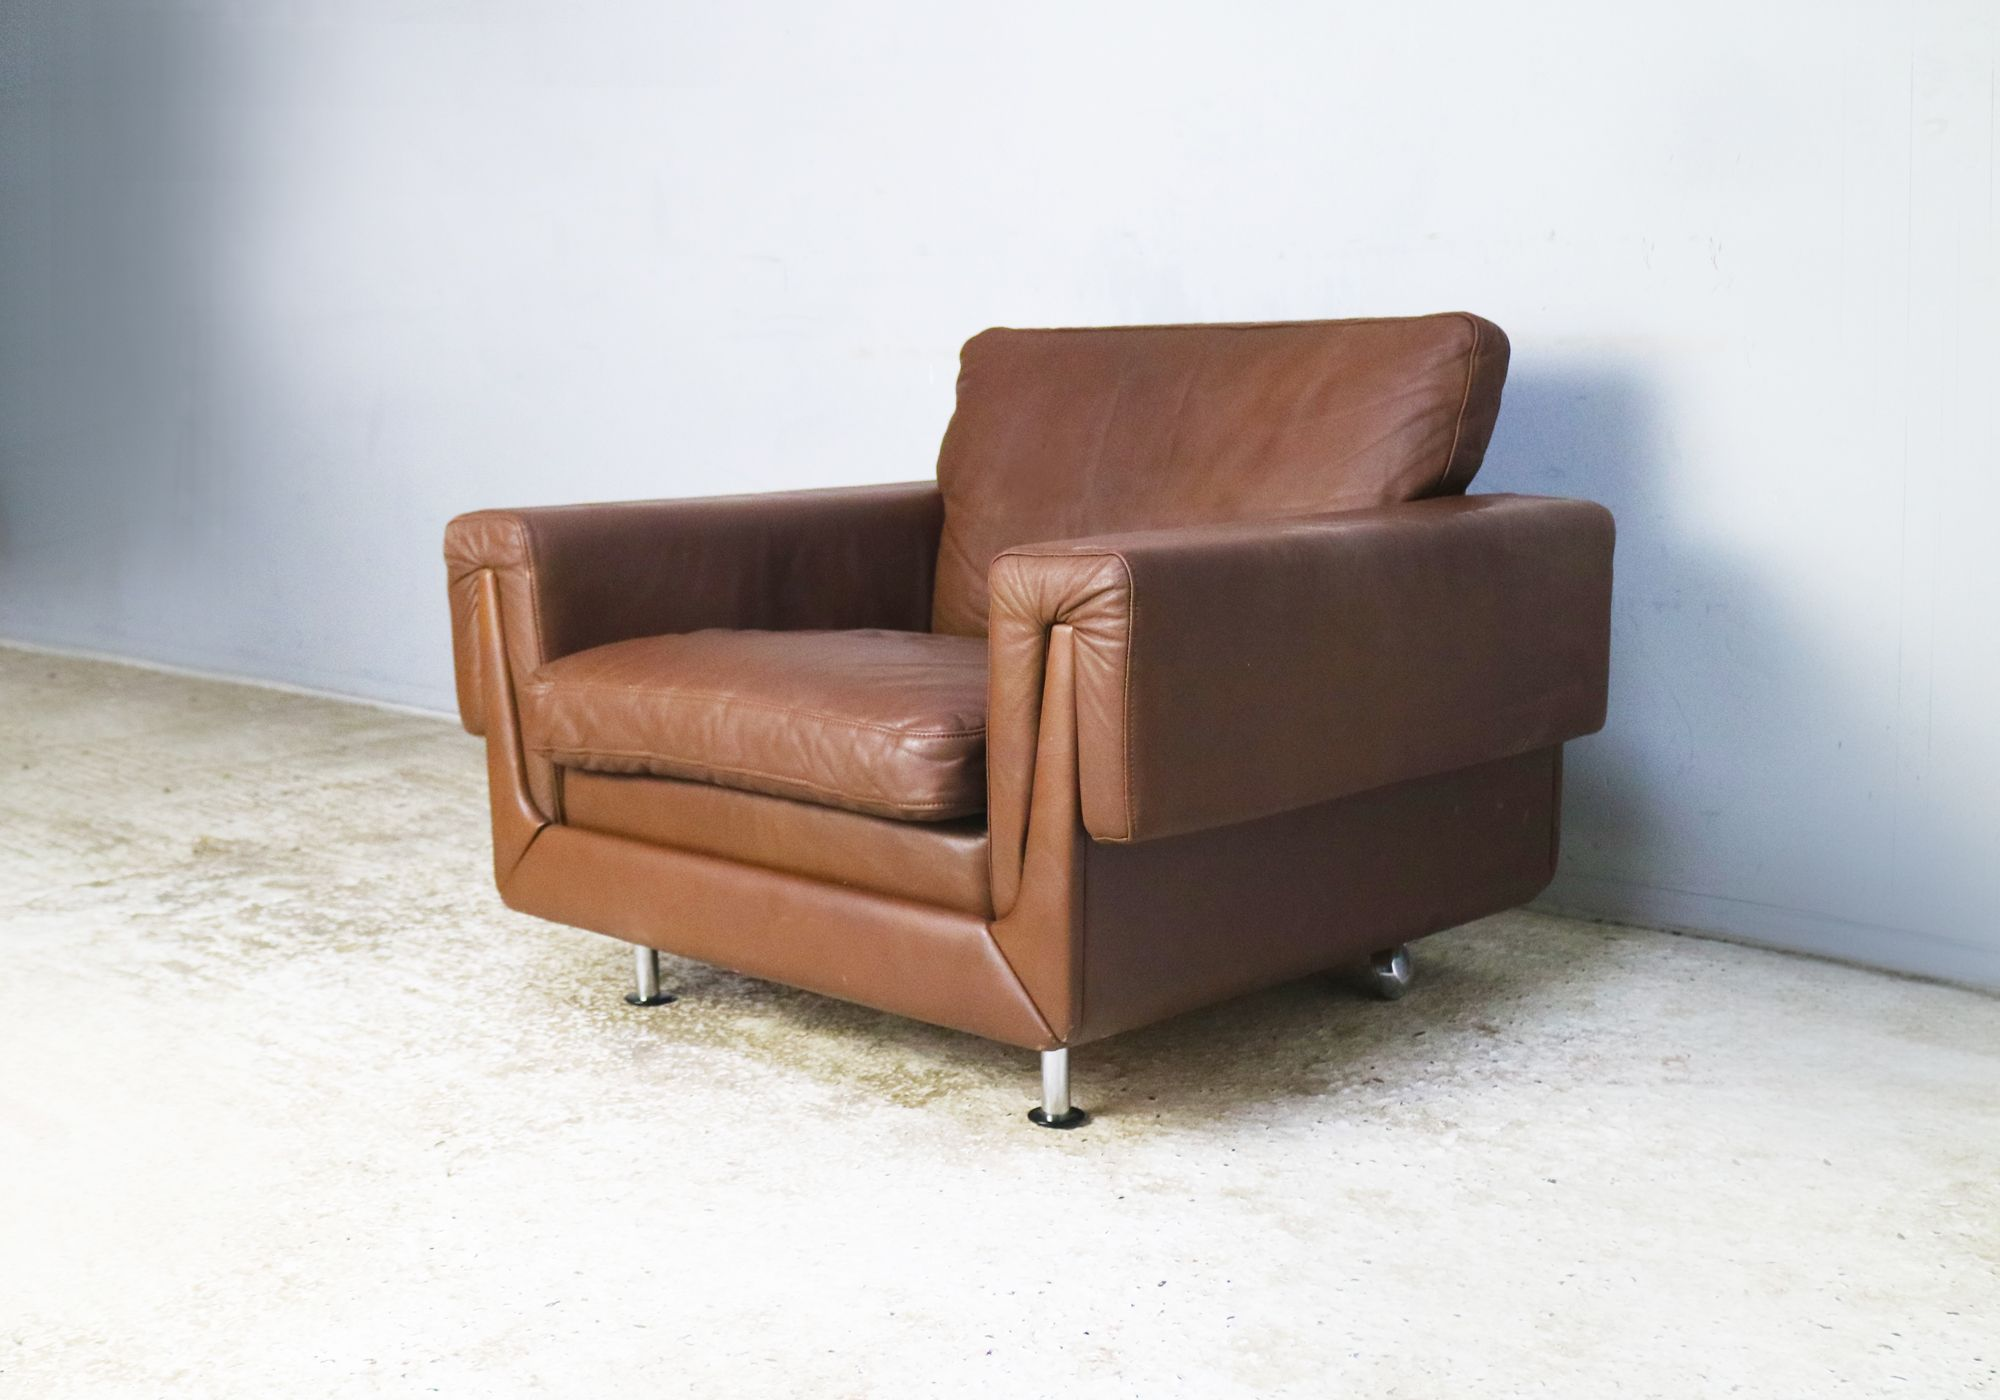 Vintage Danish leather armchair, 1970s - Design Market